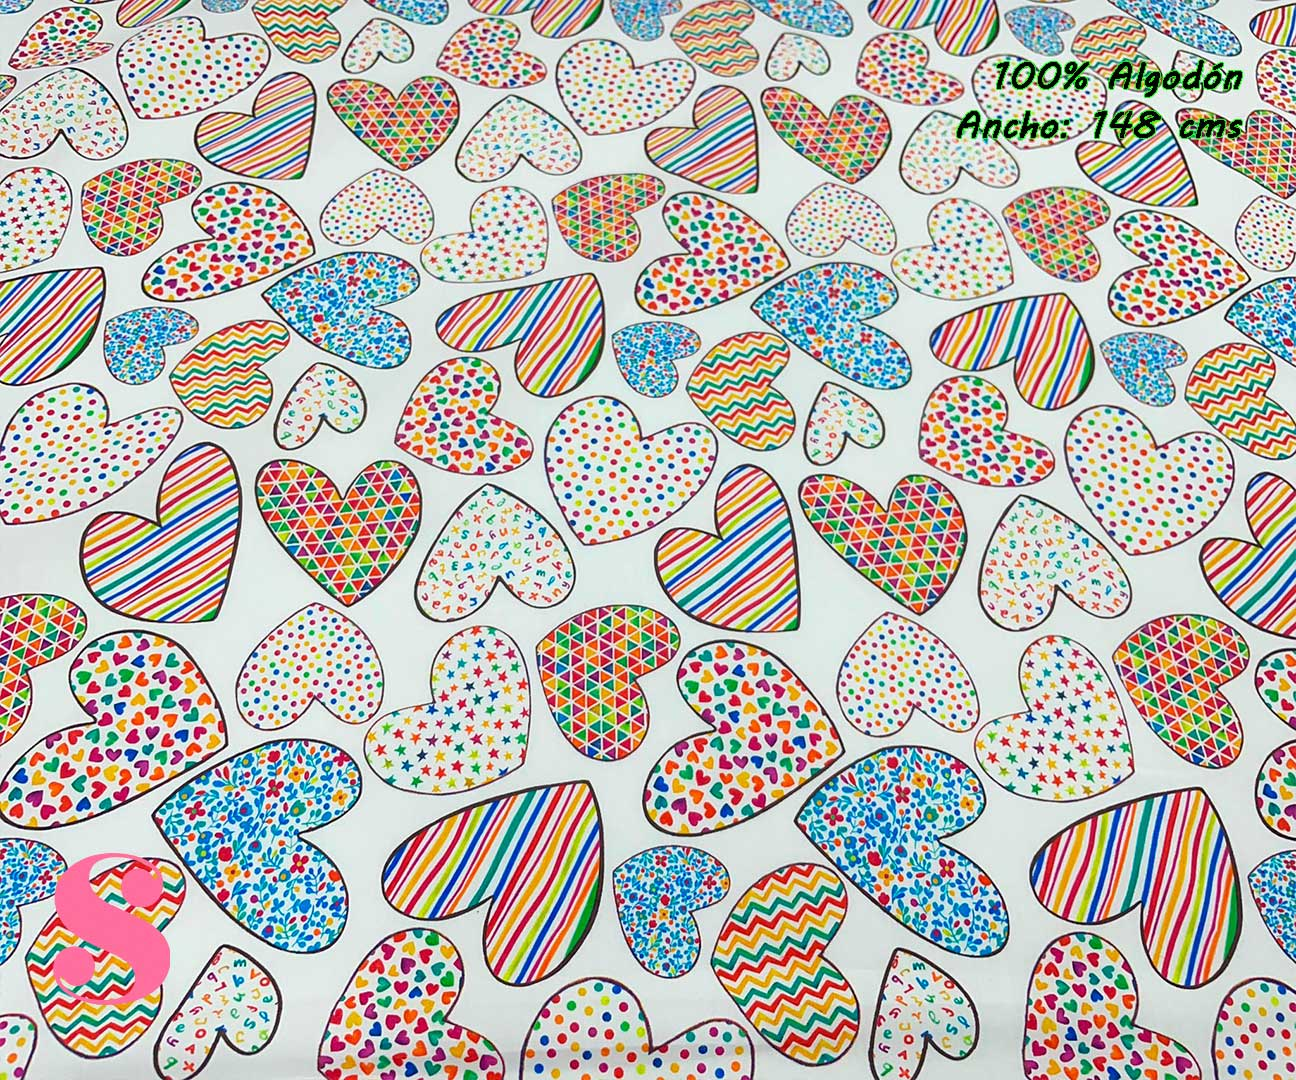 52-telas-estampadas-de-algodón,-telas-floreadas,estampados-floreados-de-algodón,estampados-origonales-de-algodón,Tejido Estampado Corazones Multicolor